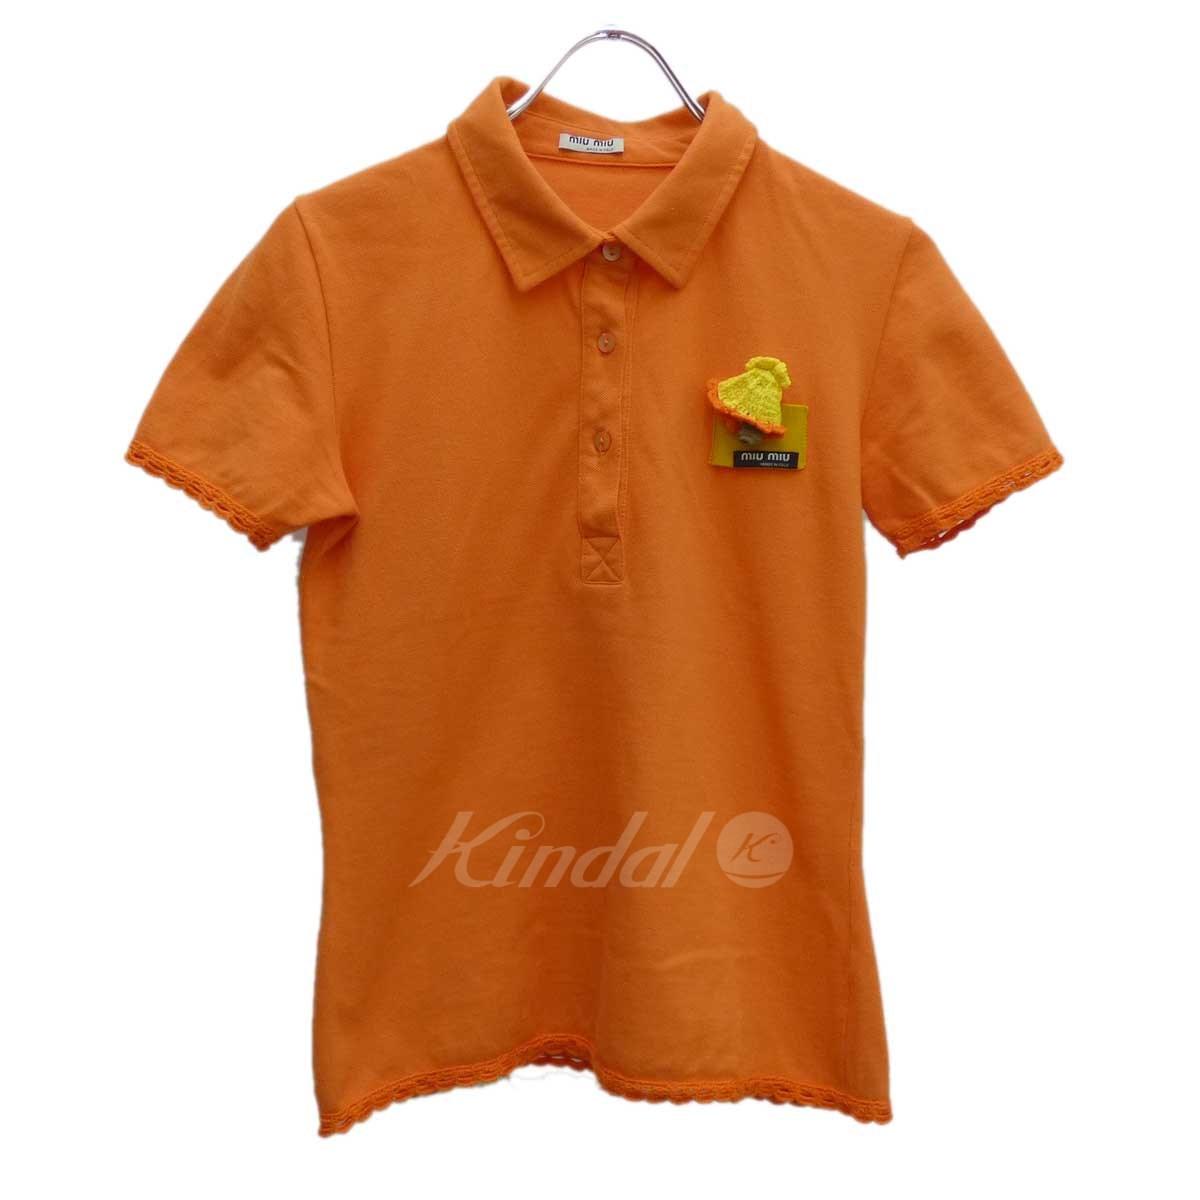 a0e85eebf miu miu chest knit motif short sleeves polo shirt orange size: M (ミュウミュウ)